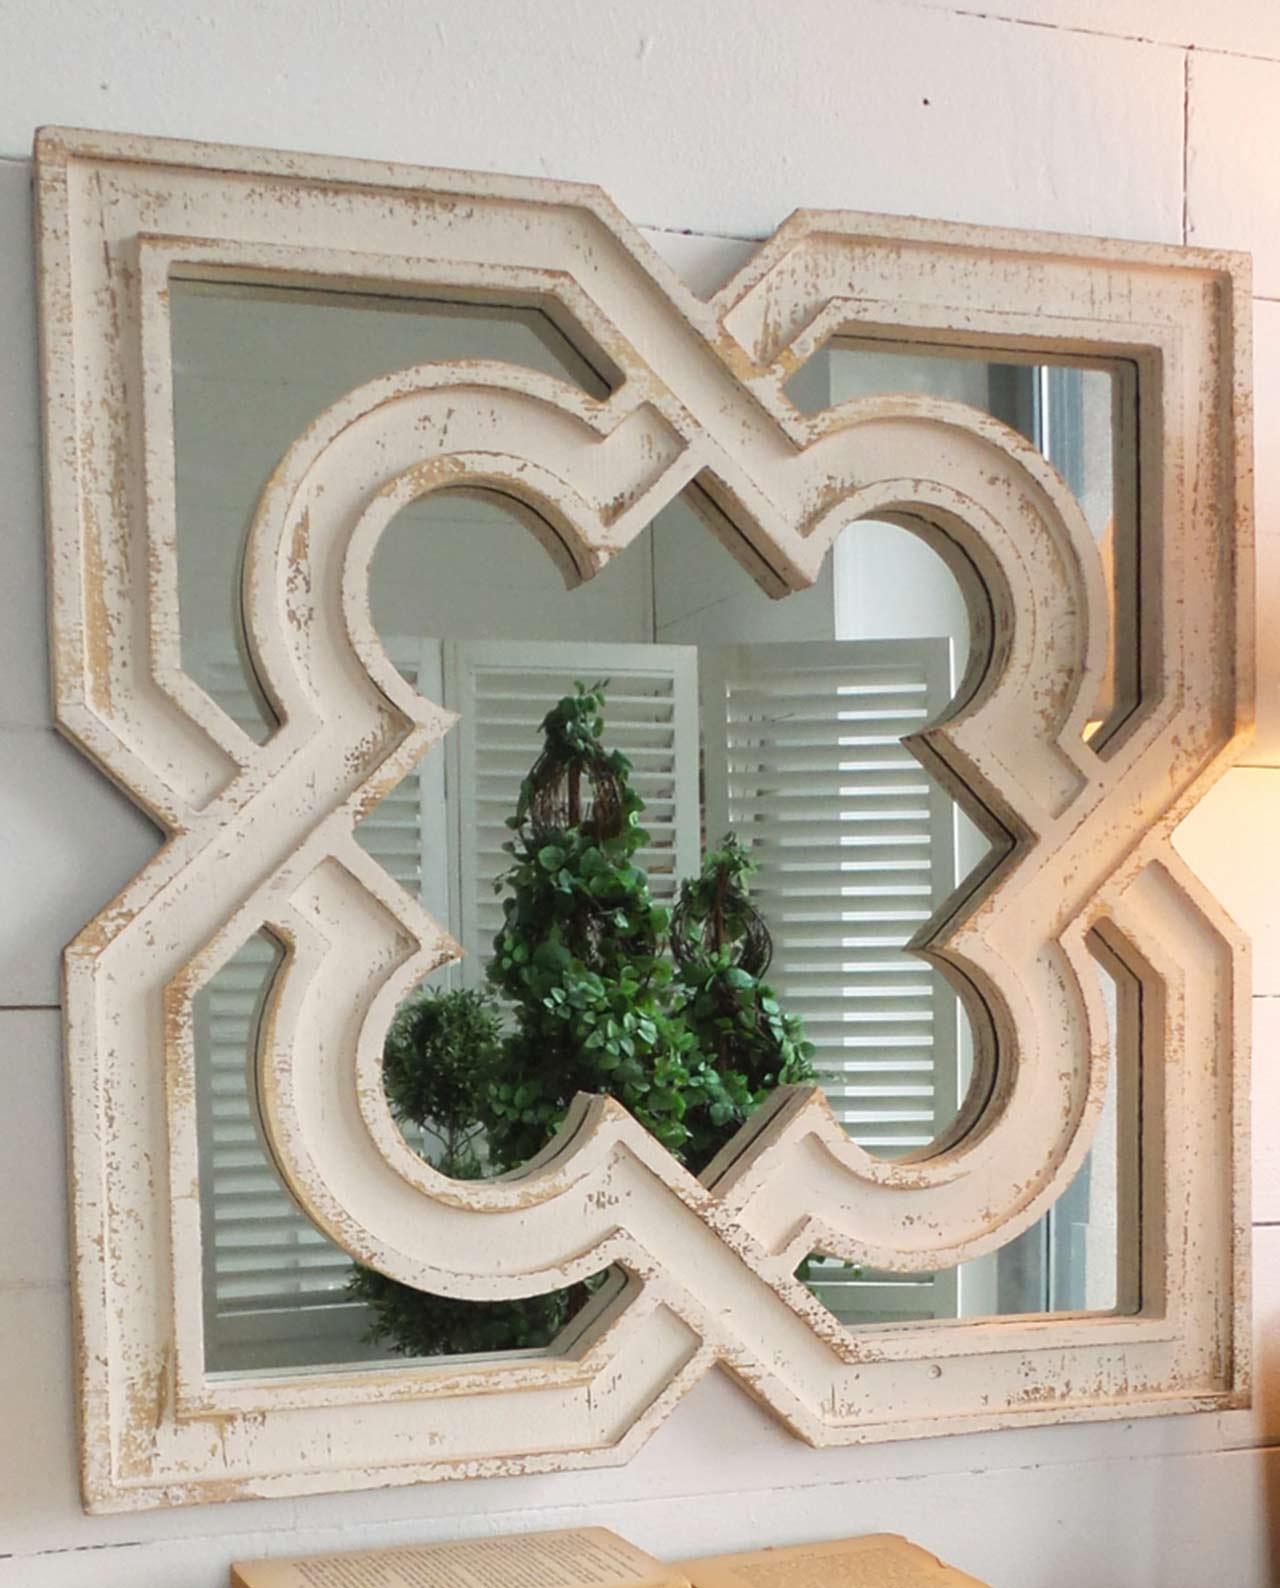 Beautiful specchi da parete particolari with specchiere particolari - Specchi particolari per bagno ...